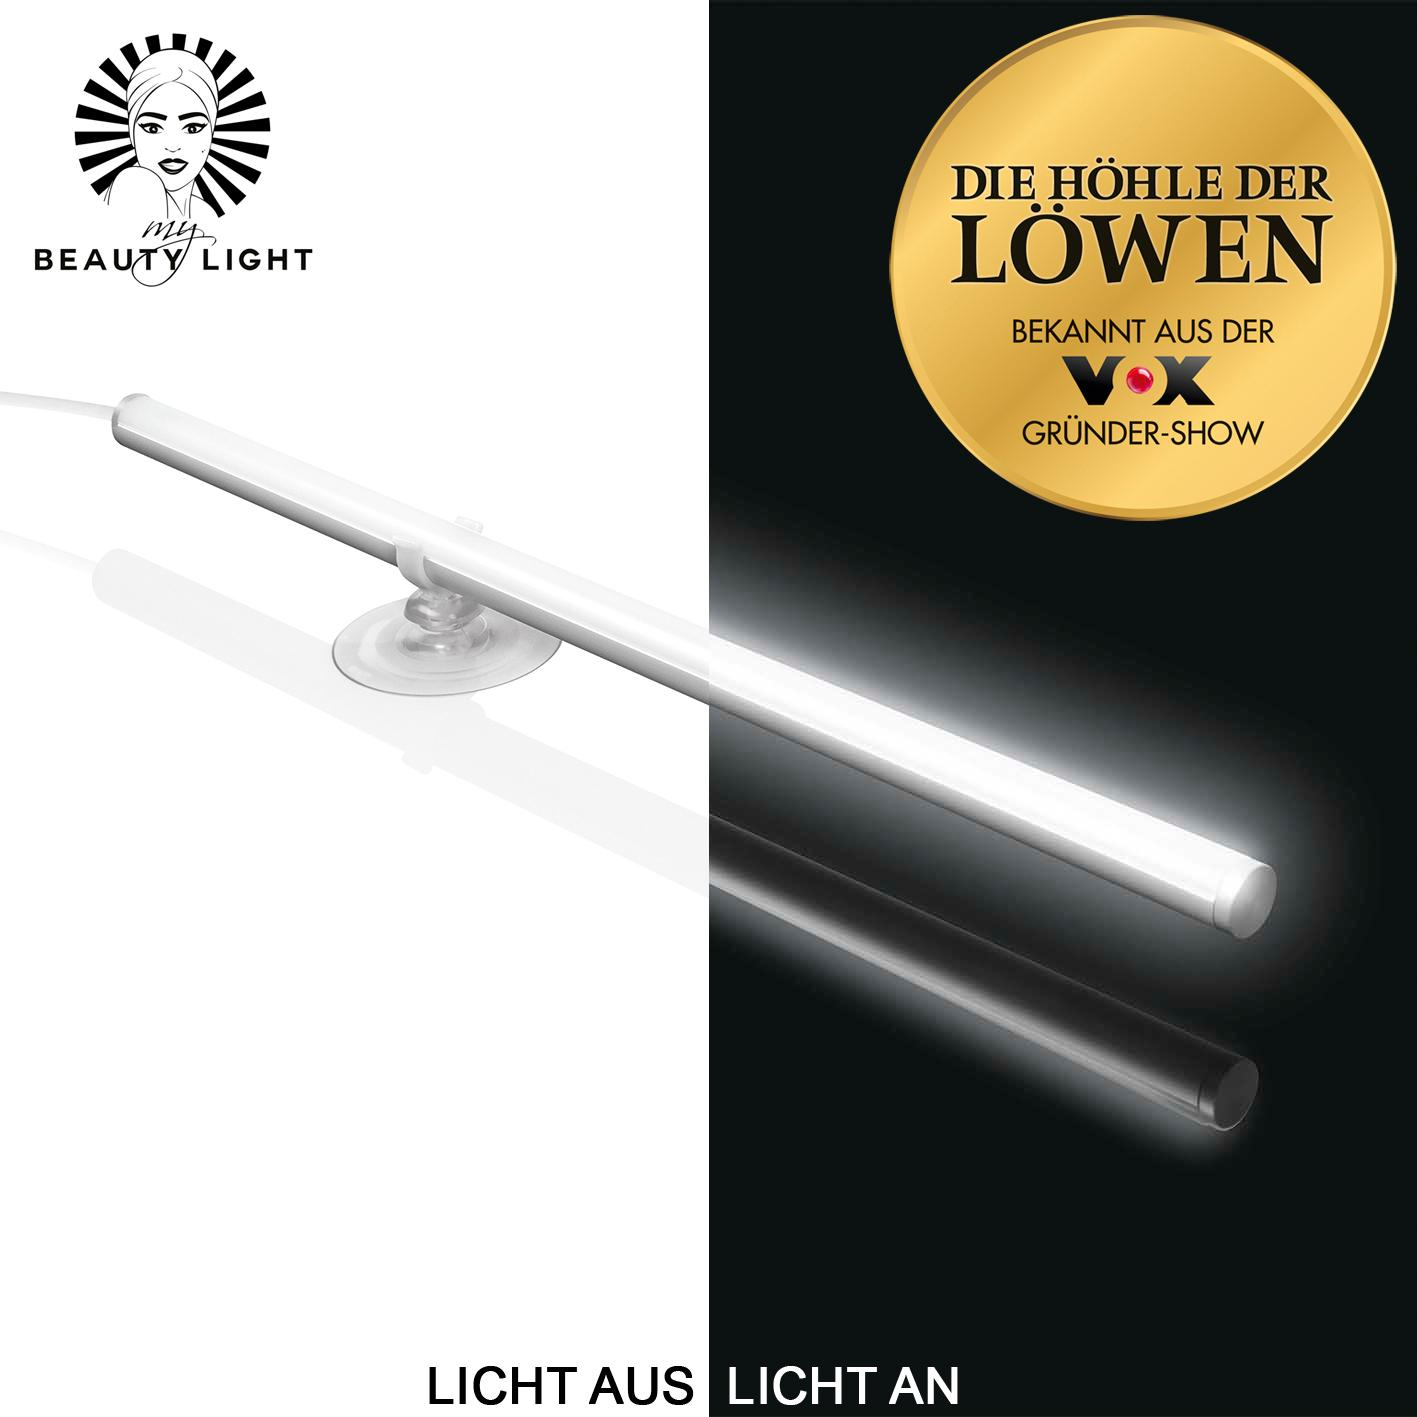 My beauty light 03690 led spiegelleuchte schminklicht - Amazon schminkspiegel ...